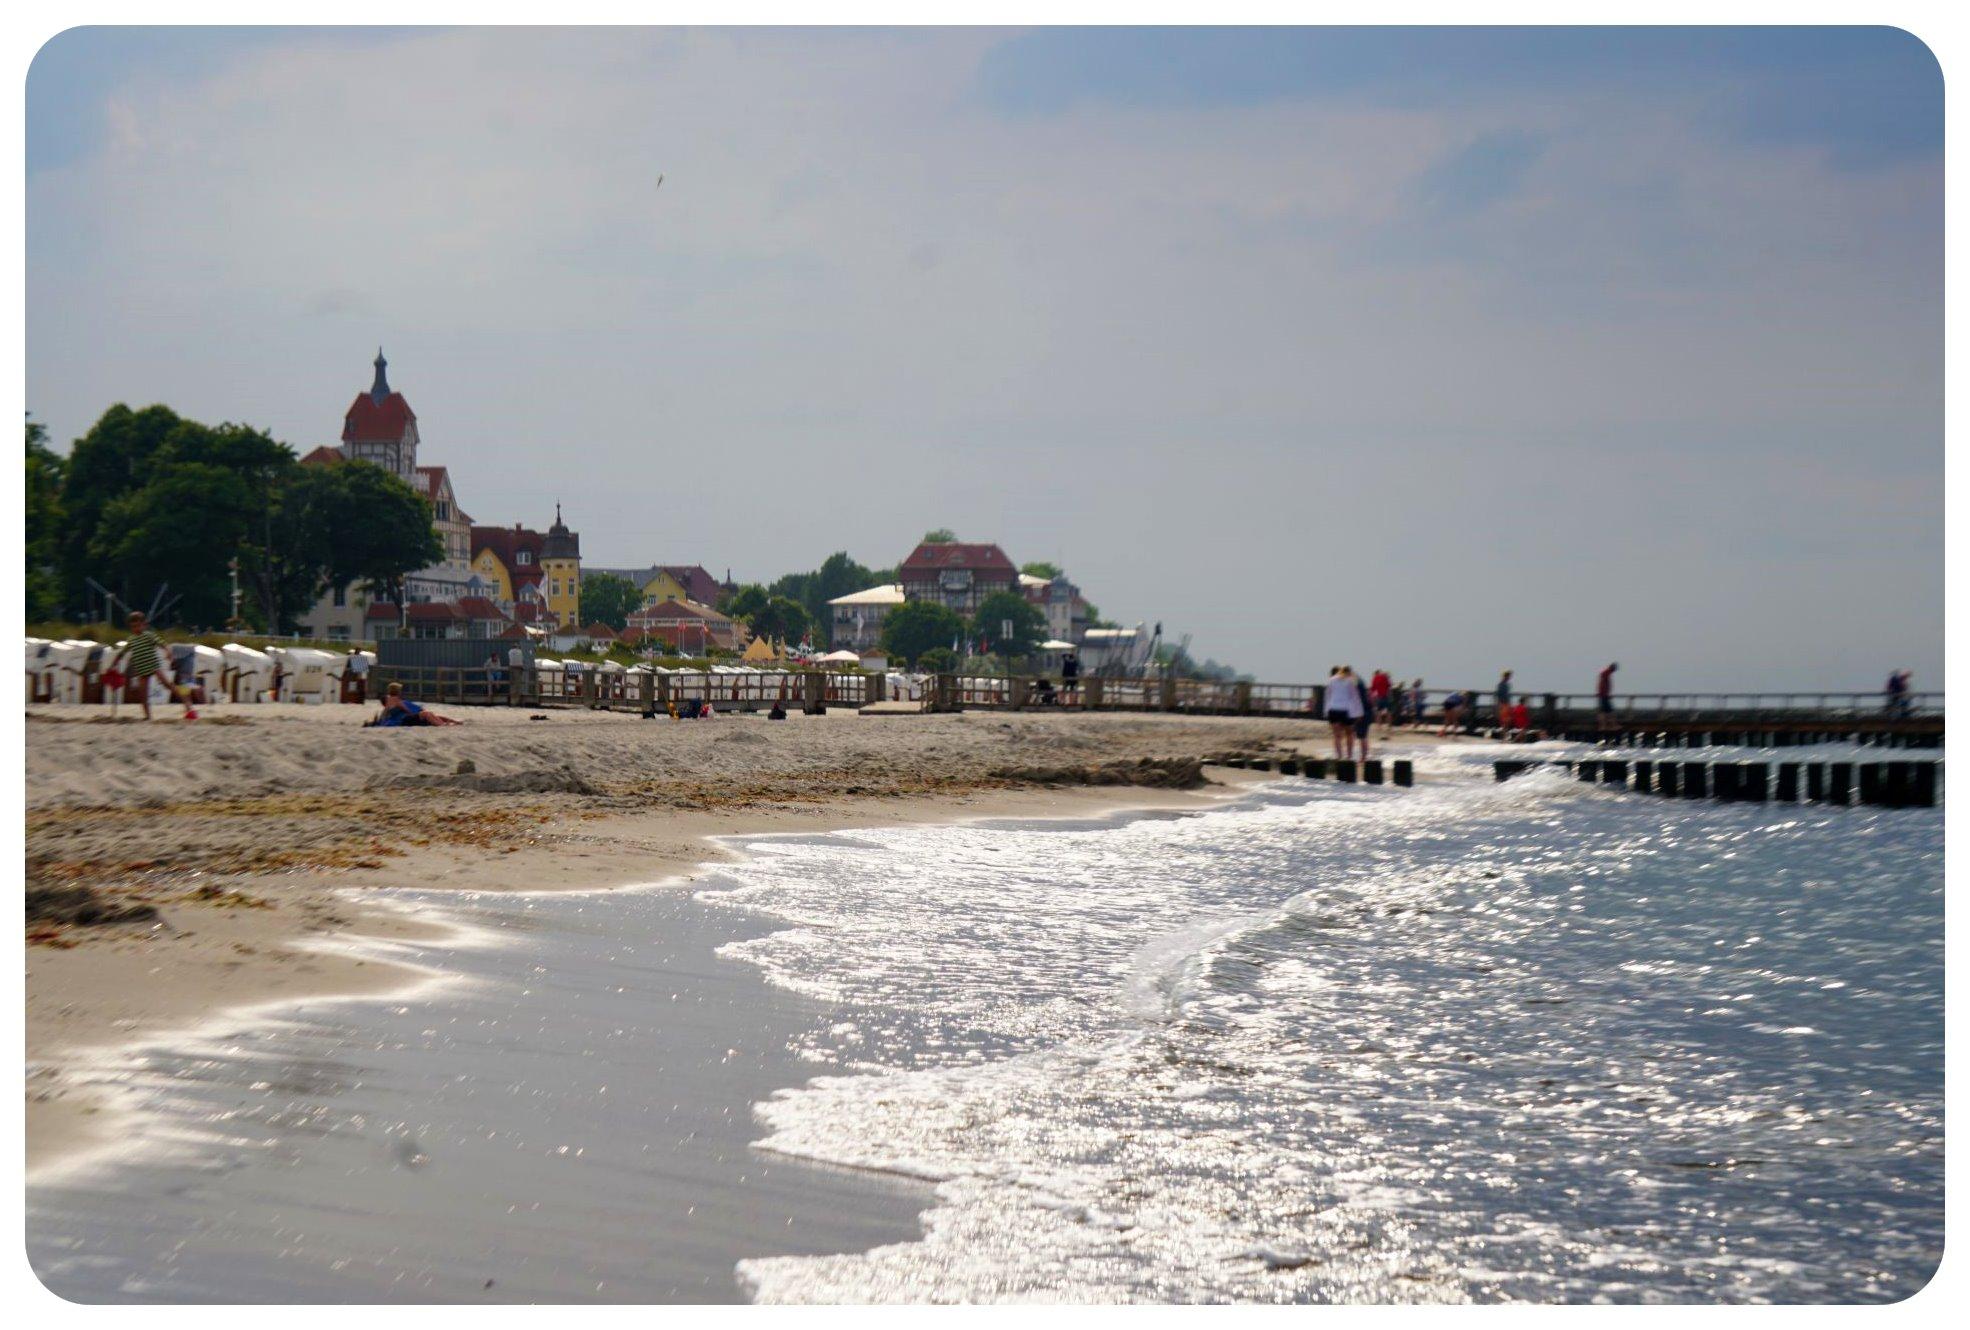 kuehlungsborn beach